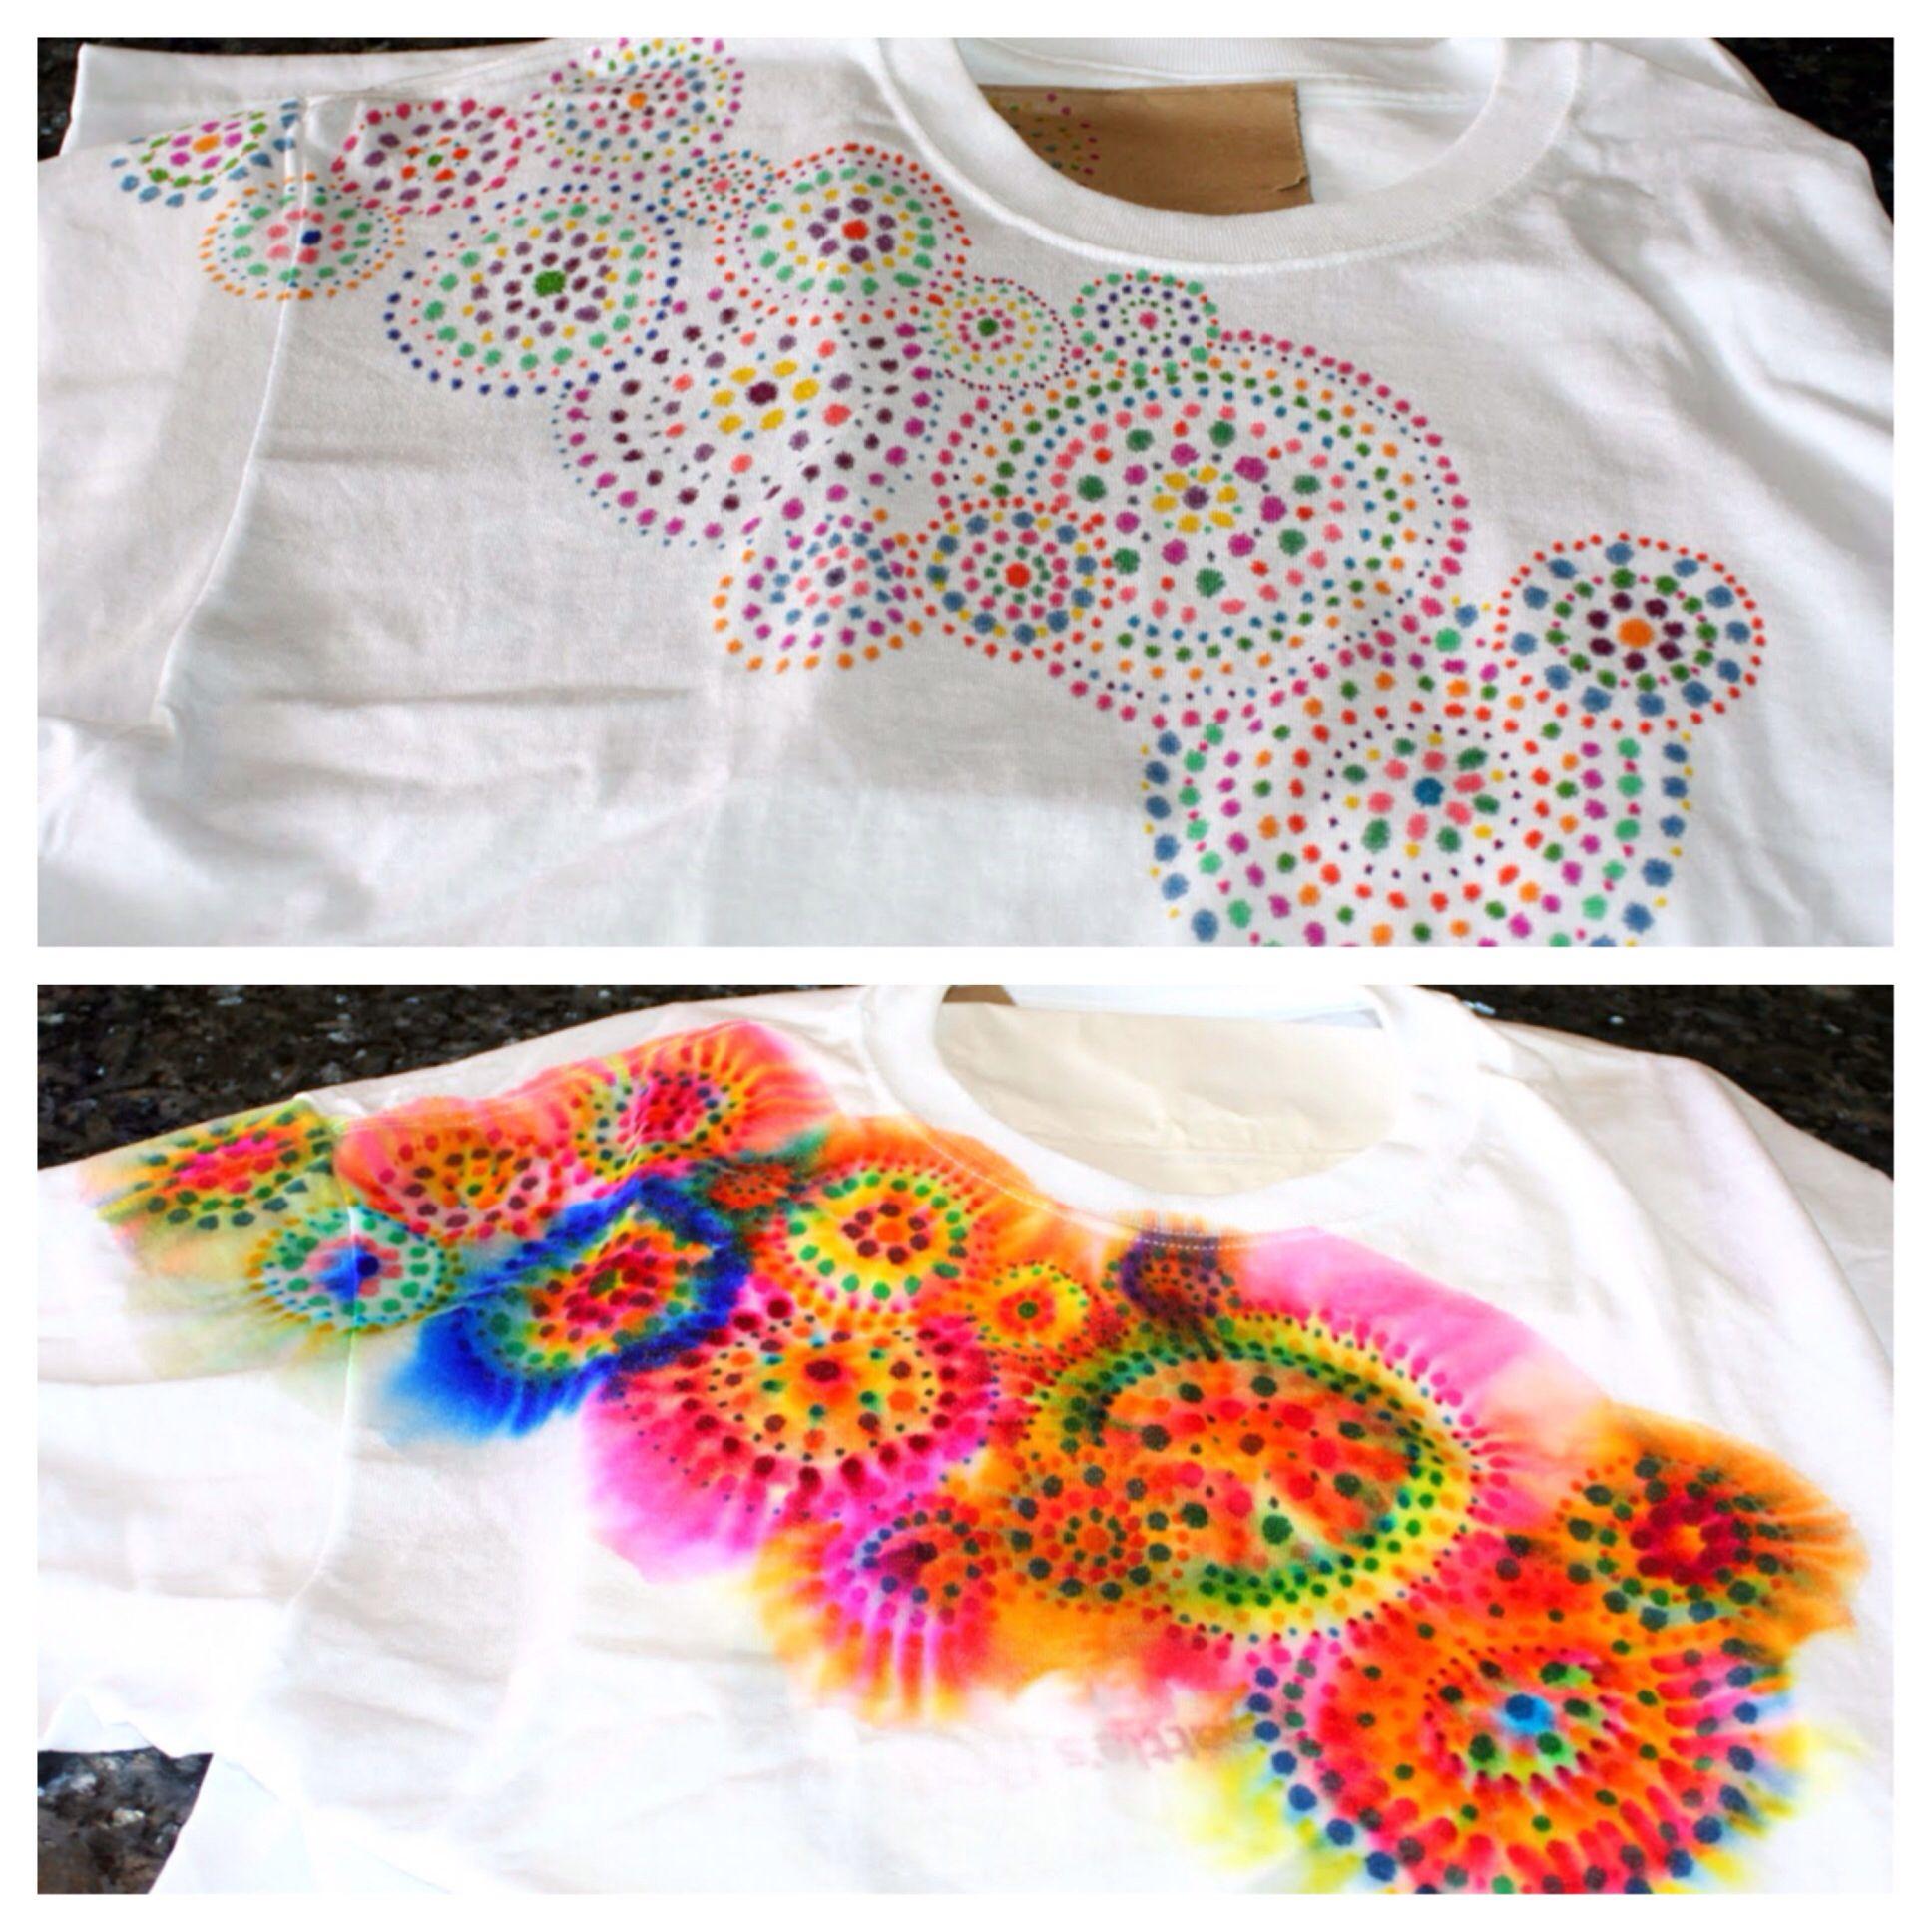 d70a49703c7550 Complex sharpie tie dye